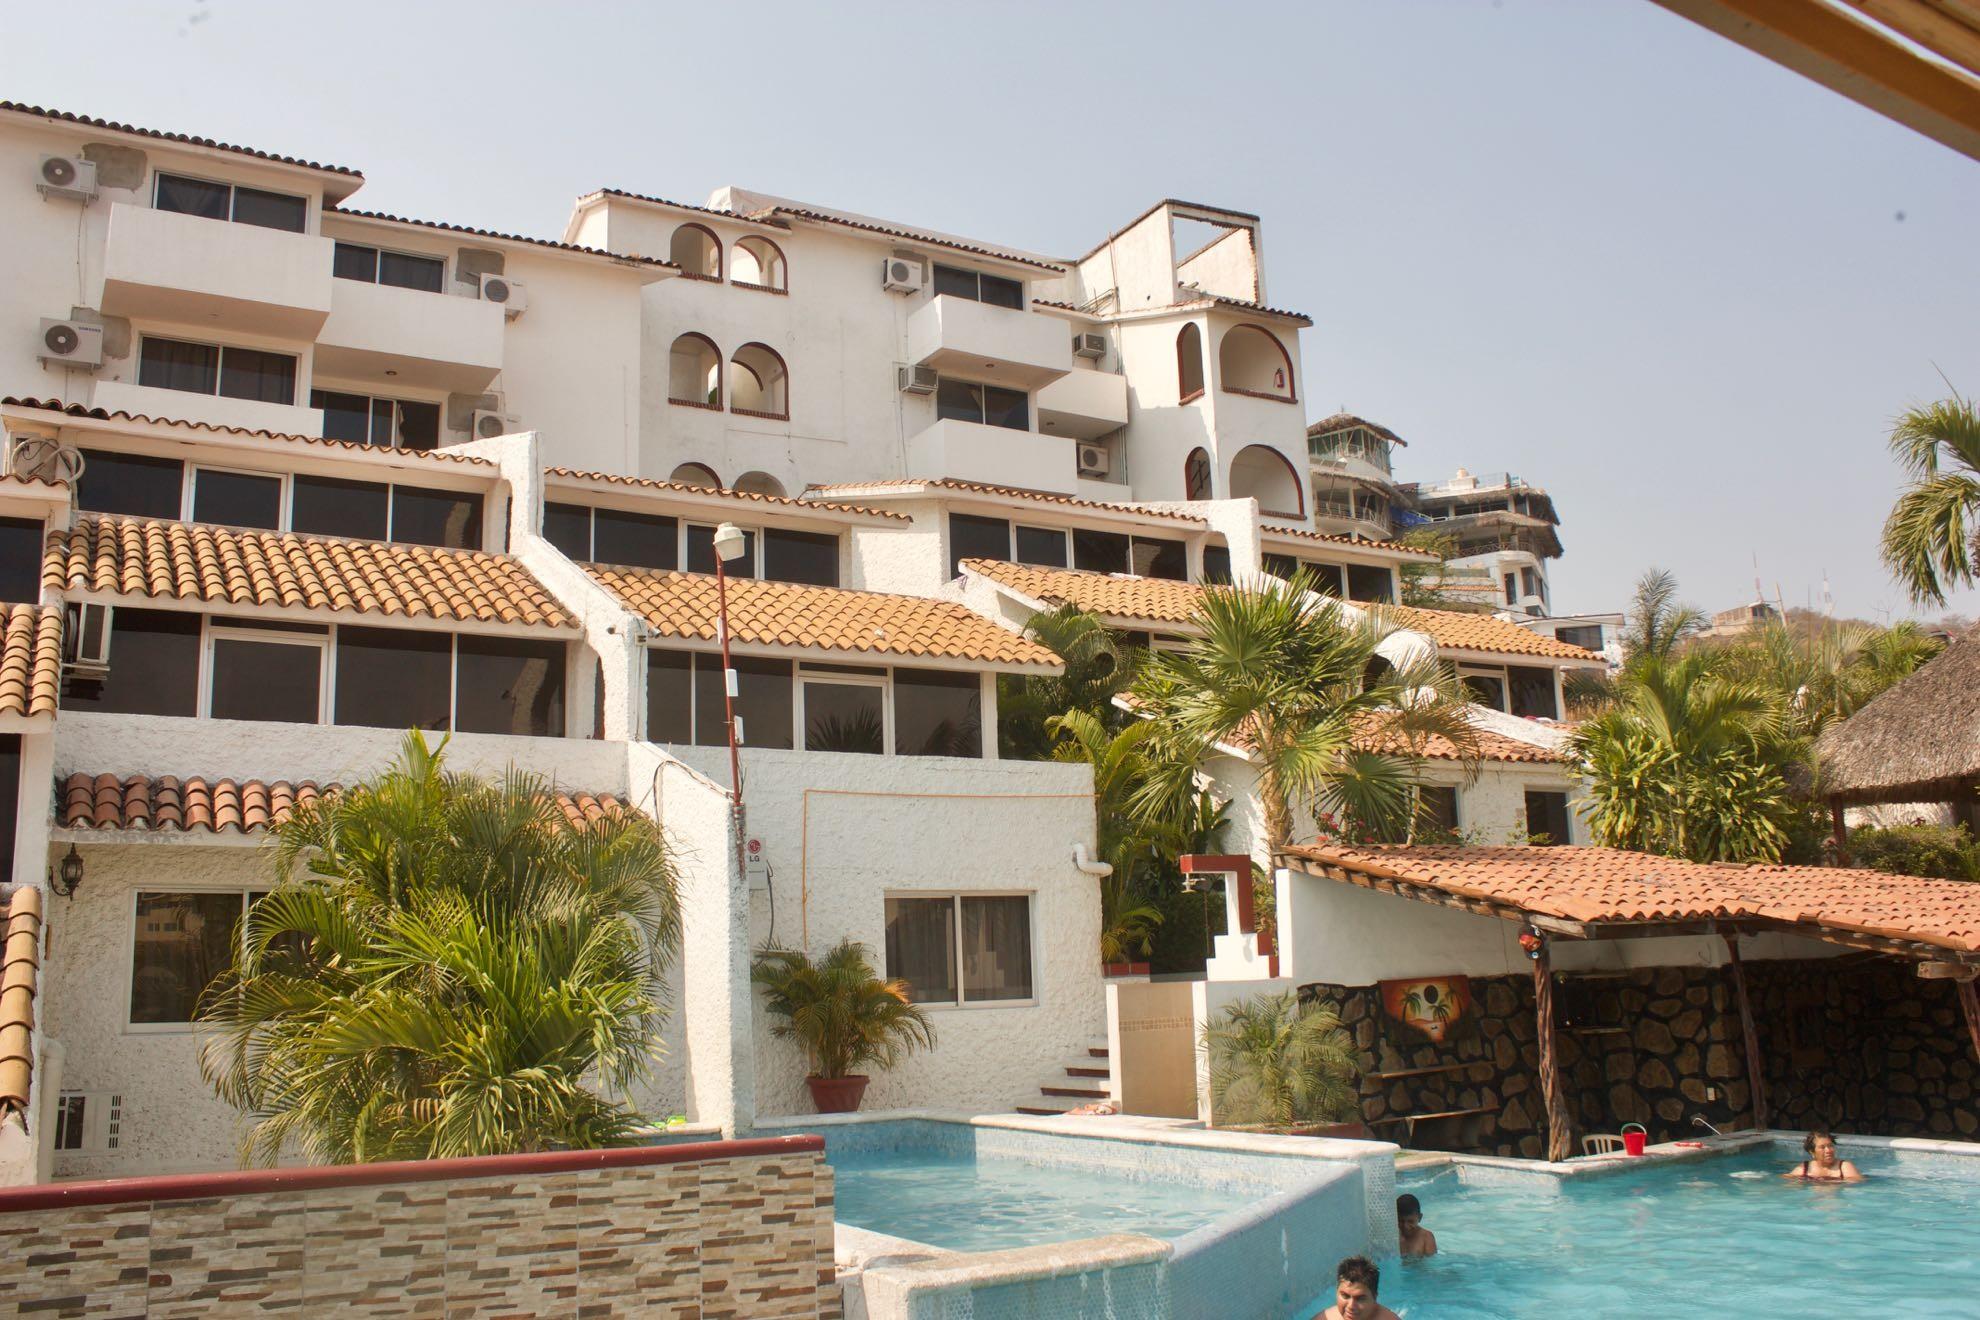 Panoramica del hotel Yamba Acapulco